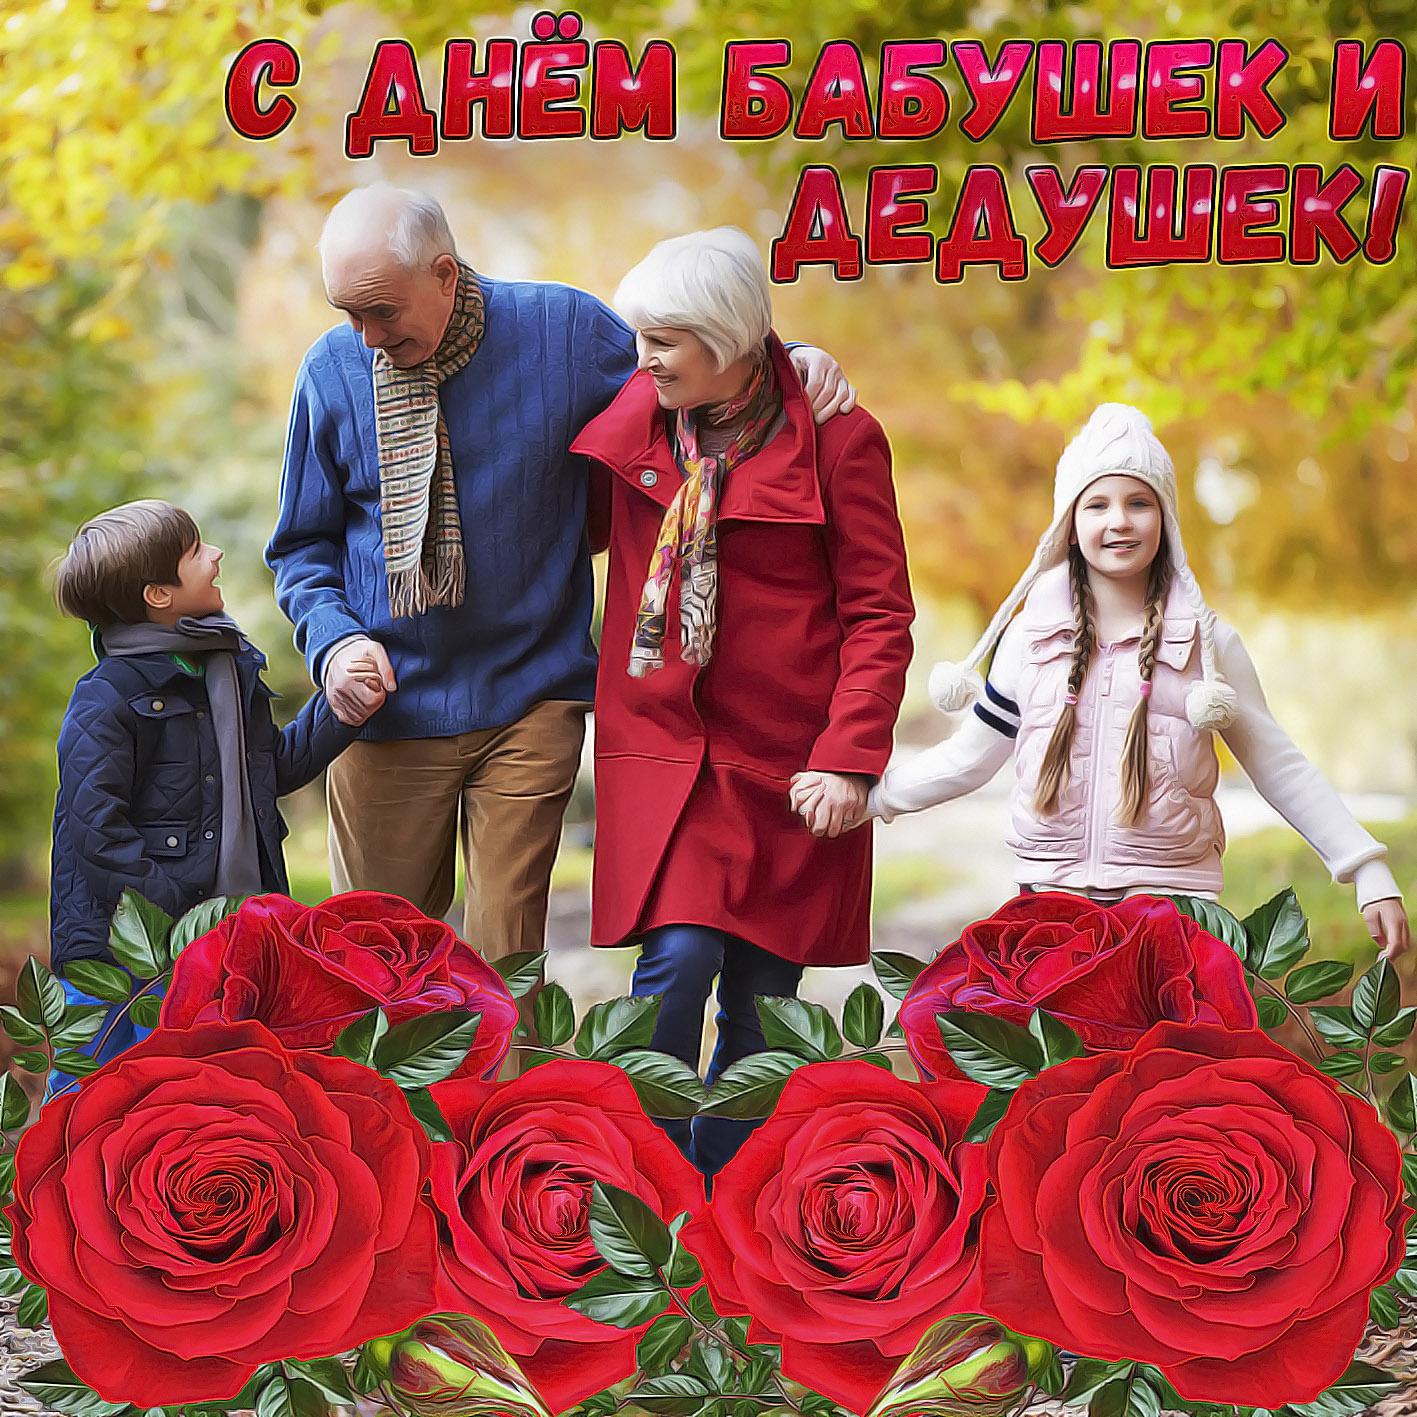 Открытки для бабушке и дедушке, лучшая открытки